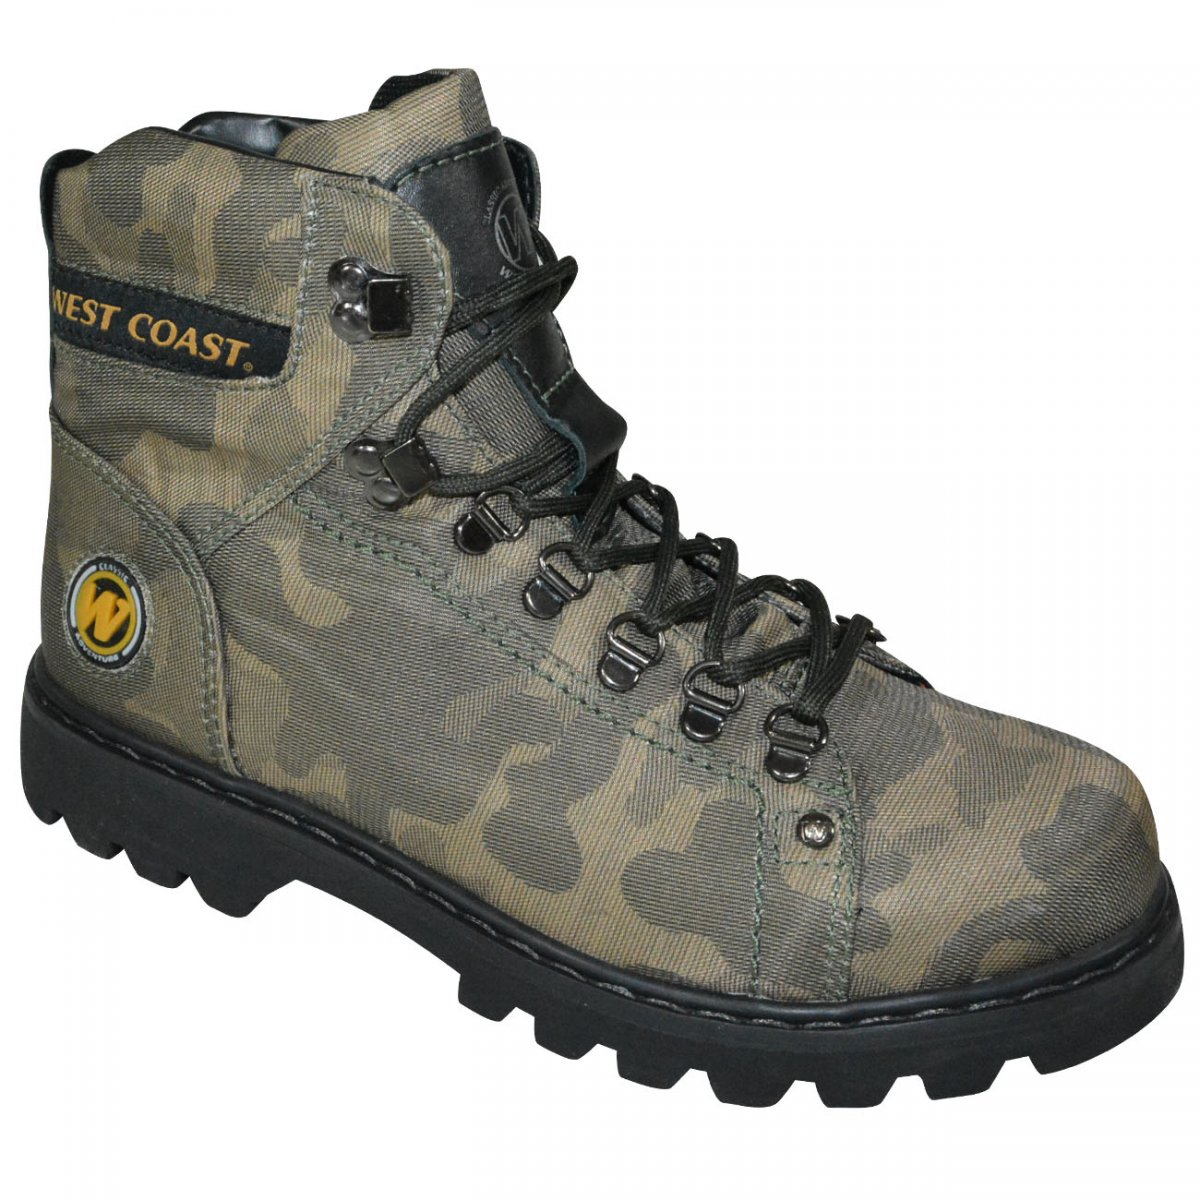 522015ae1 Bota West Coast Worker 5790 5909 - 3 - Verde Militar Preto - Chuteira Nike